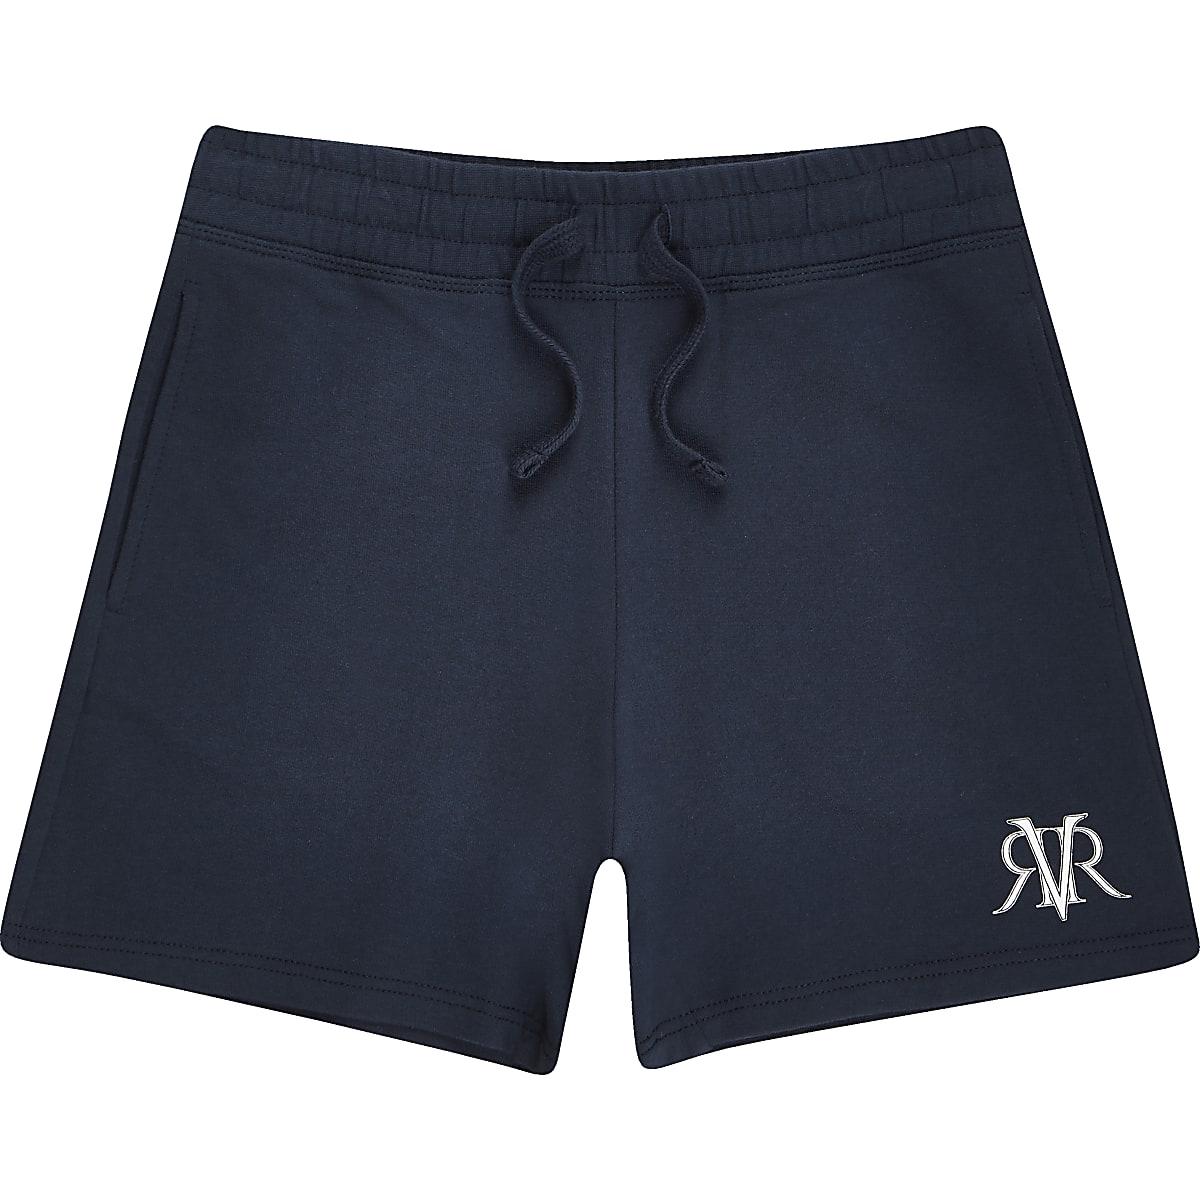 Mini boys navy 'Dude' print shorts